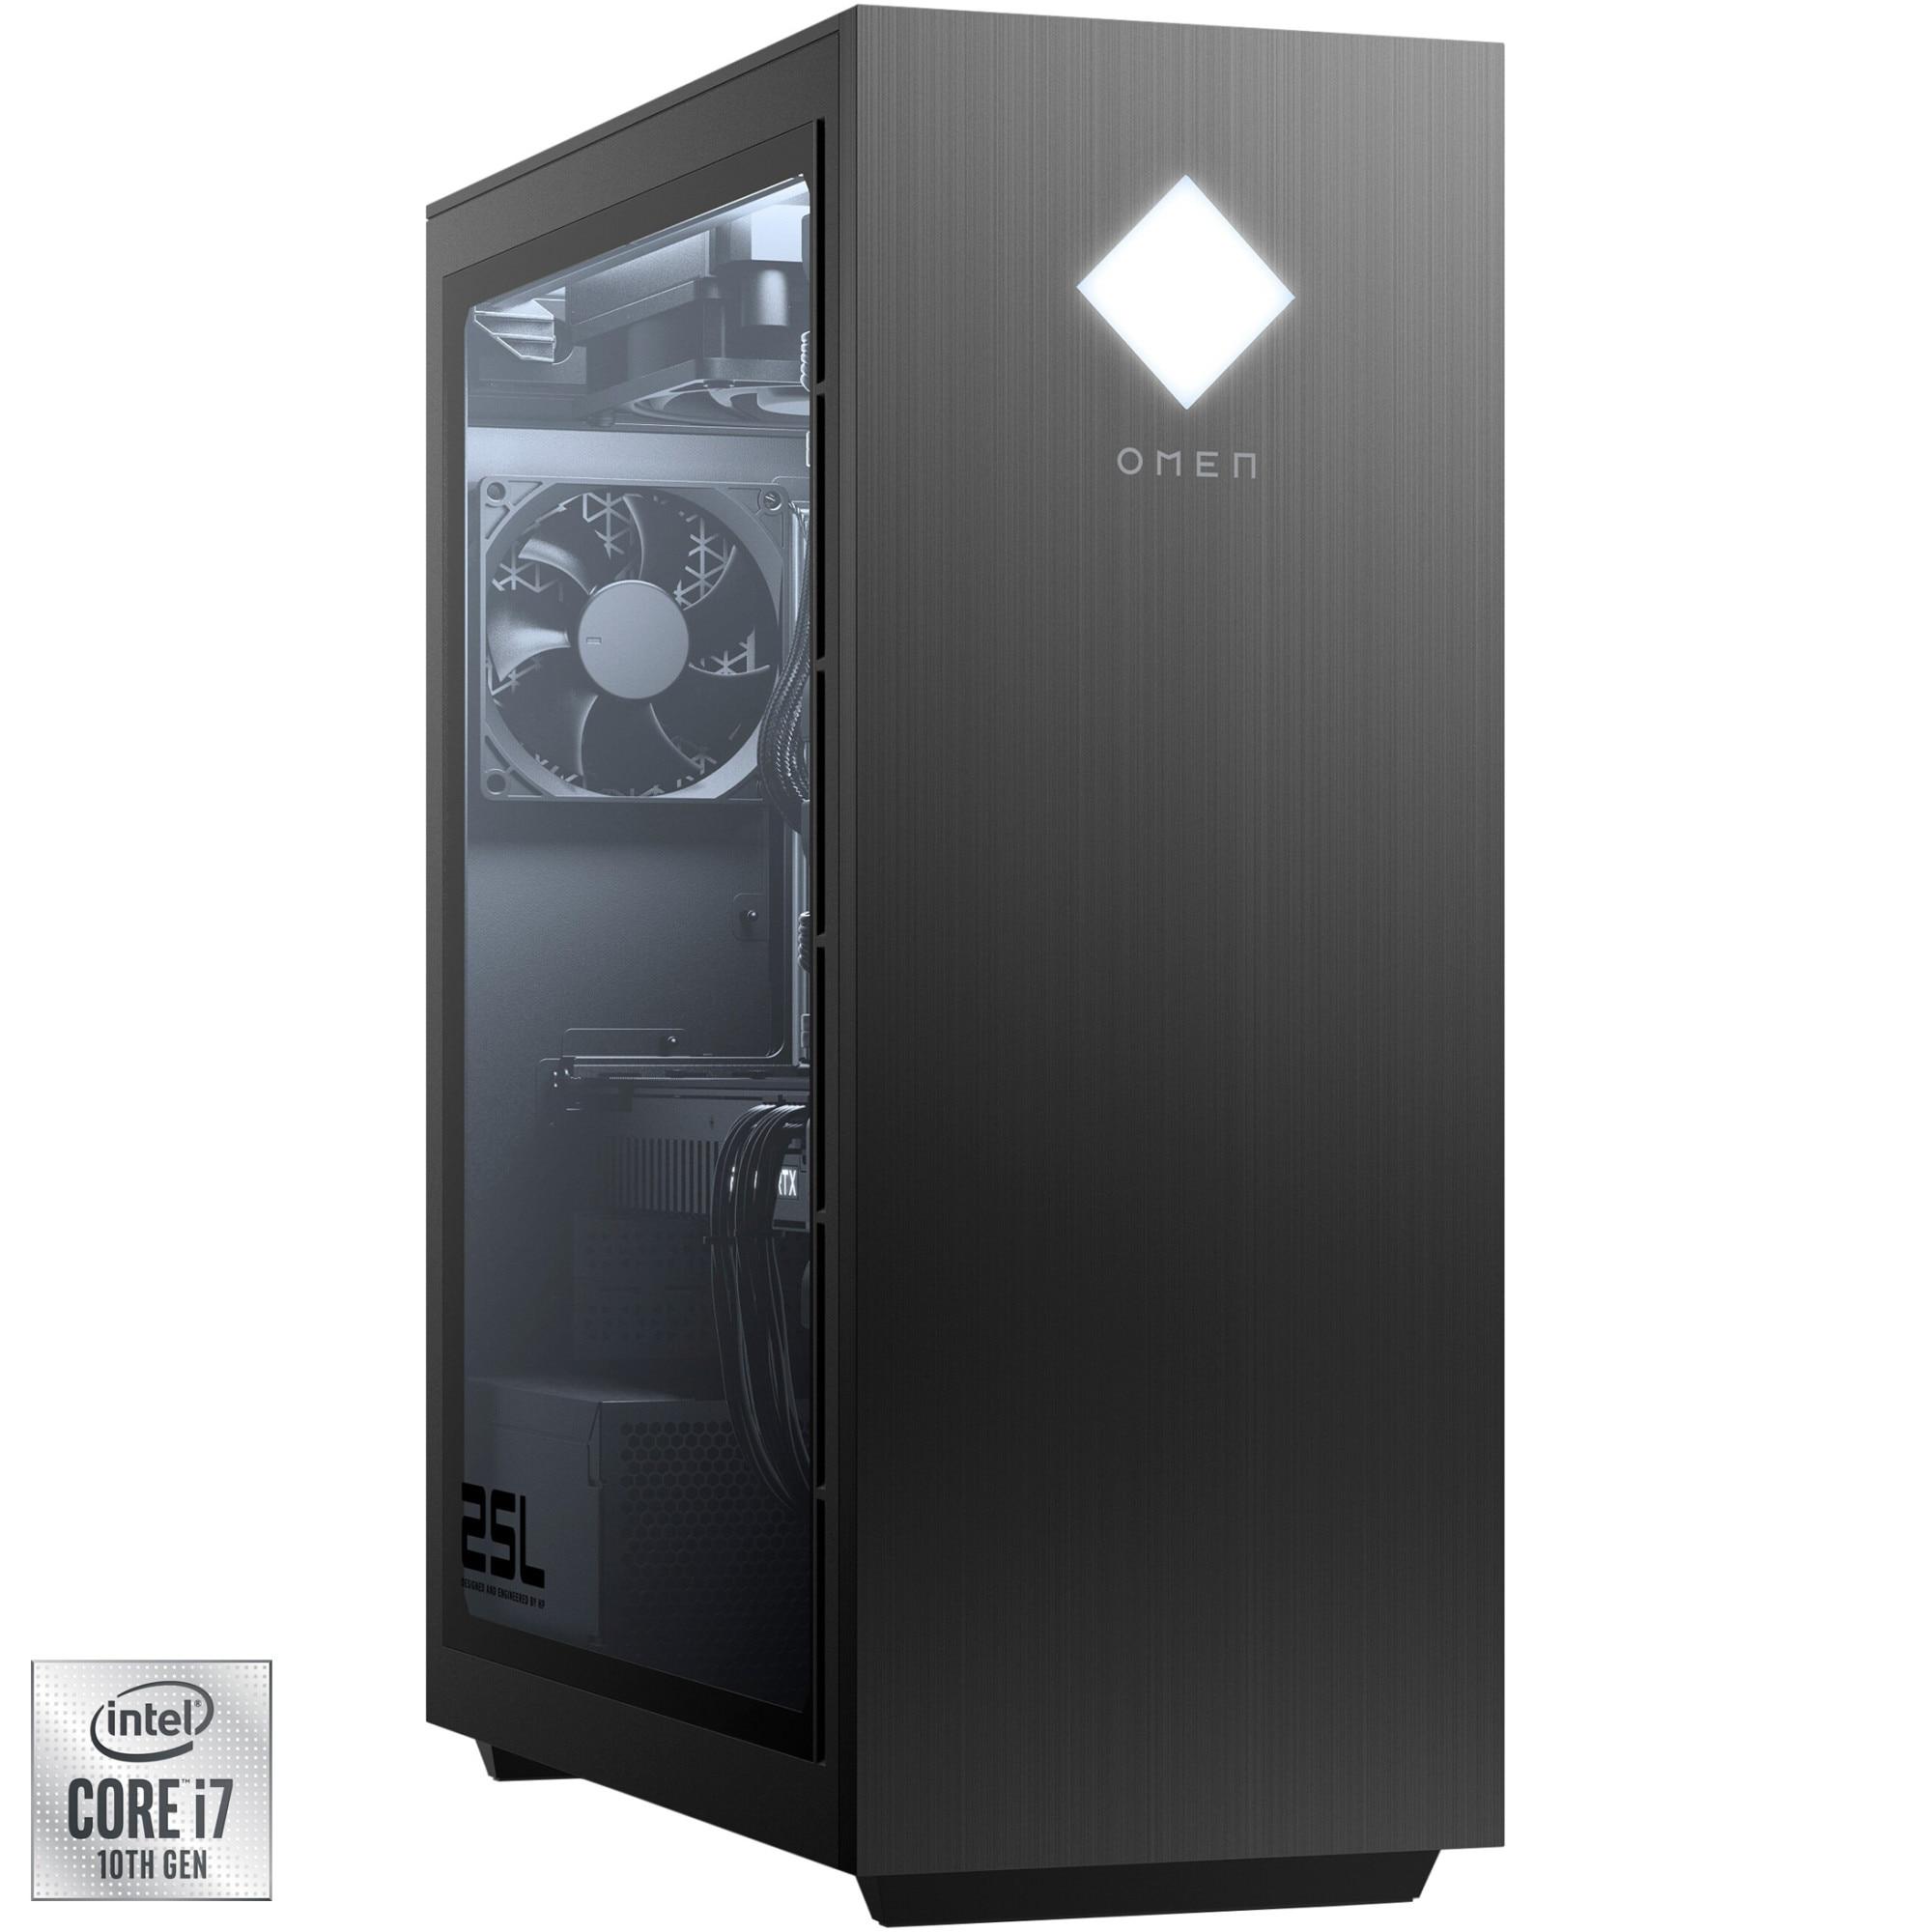 Fotografie Sistem Gaming PC OMEN by HP GT12-0031nq cu procesor Intel® Core™ i7-10700F pana la 4.80 GHz, Comet Lake, 16GB DDR4, 1TB HDD + 256GB SSD NVMe, GeForce® GTX 1660 Super™ 6GB GDDR6, Free DOS